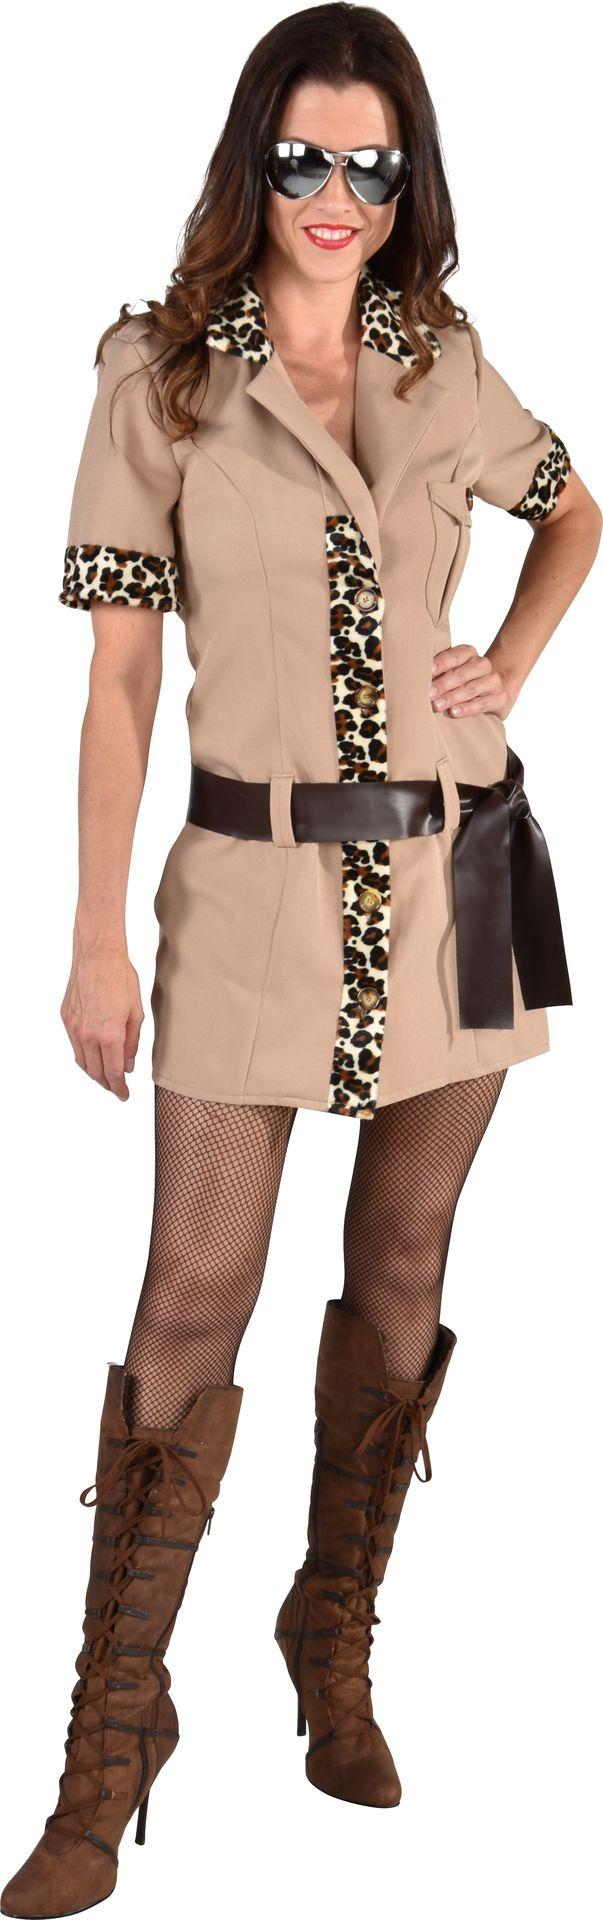 Safari outfit meisjes